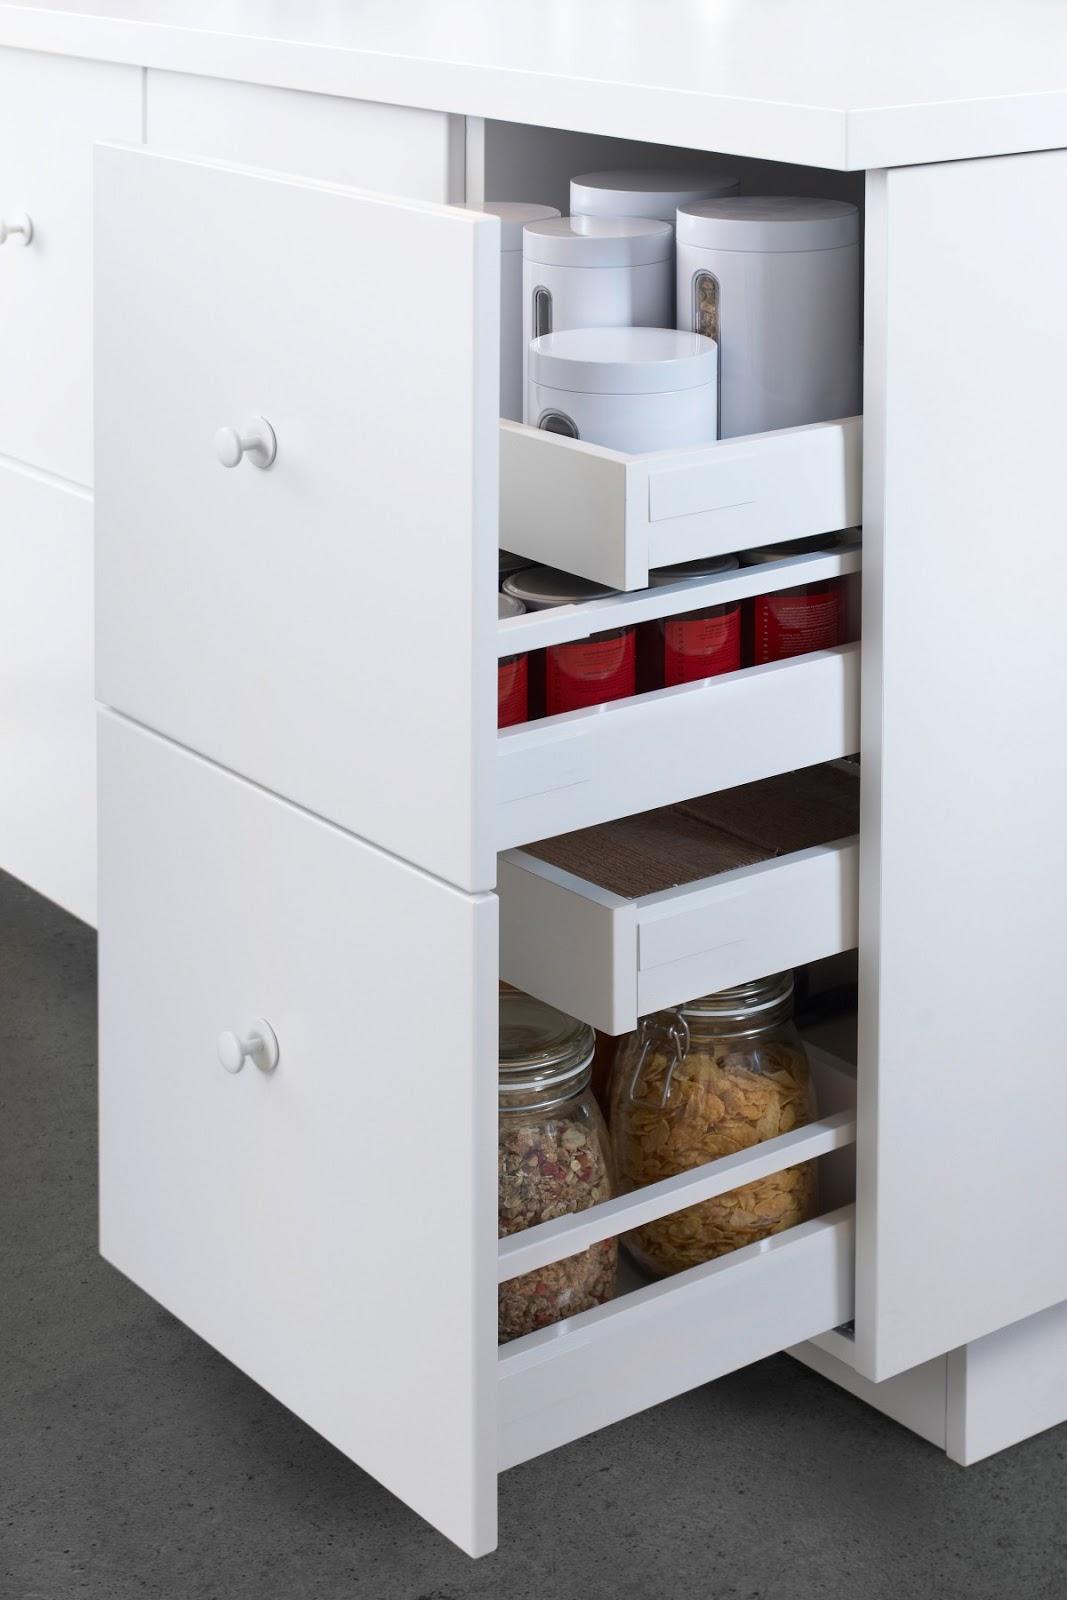 matro ikeas metod. Black Bedroom Furniture Sets. Home Design Ideas